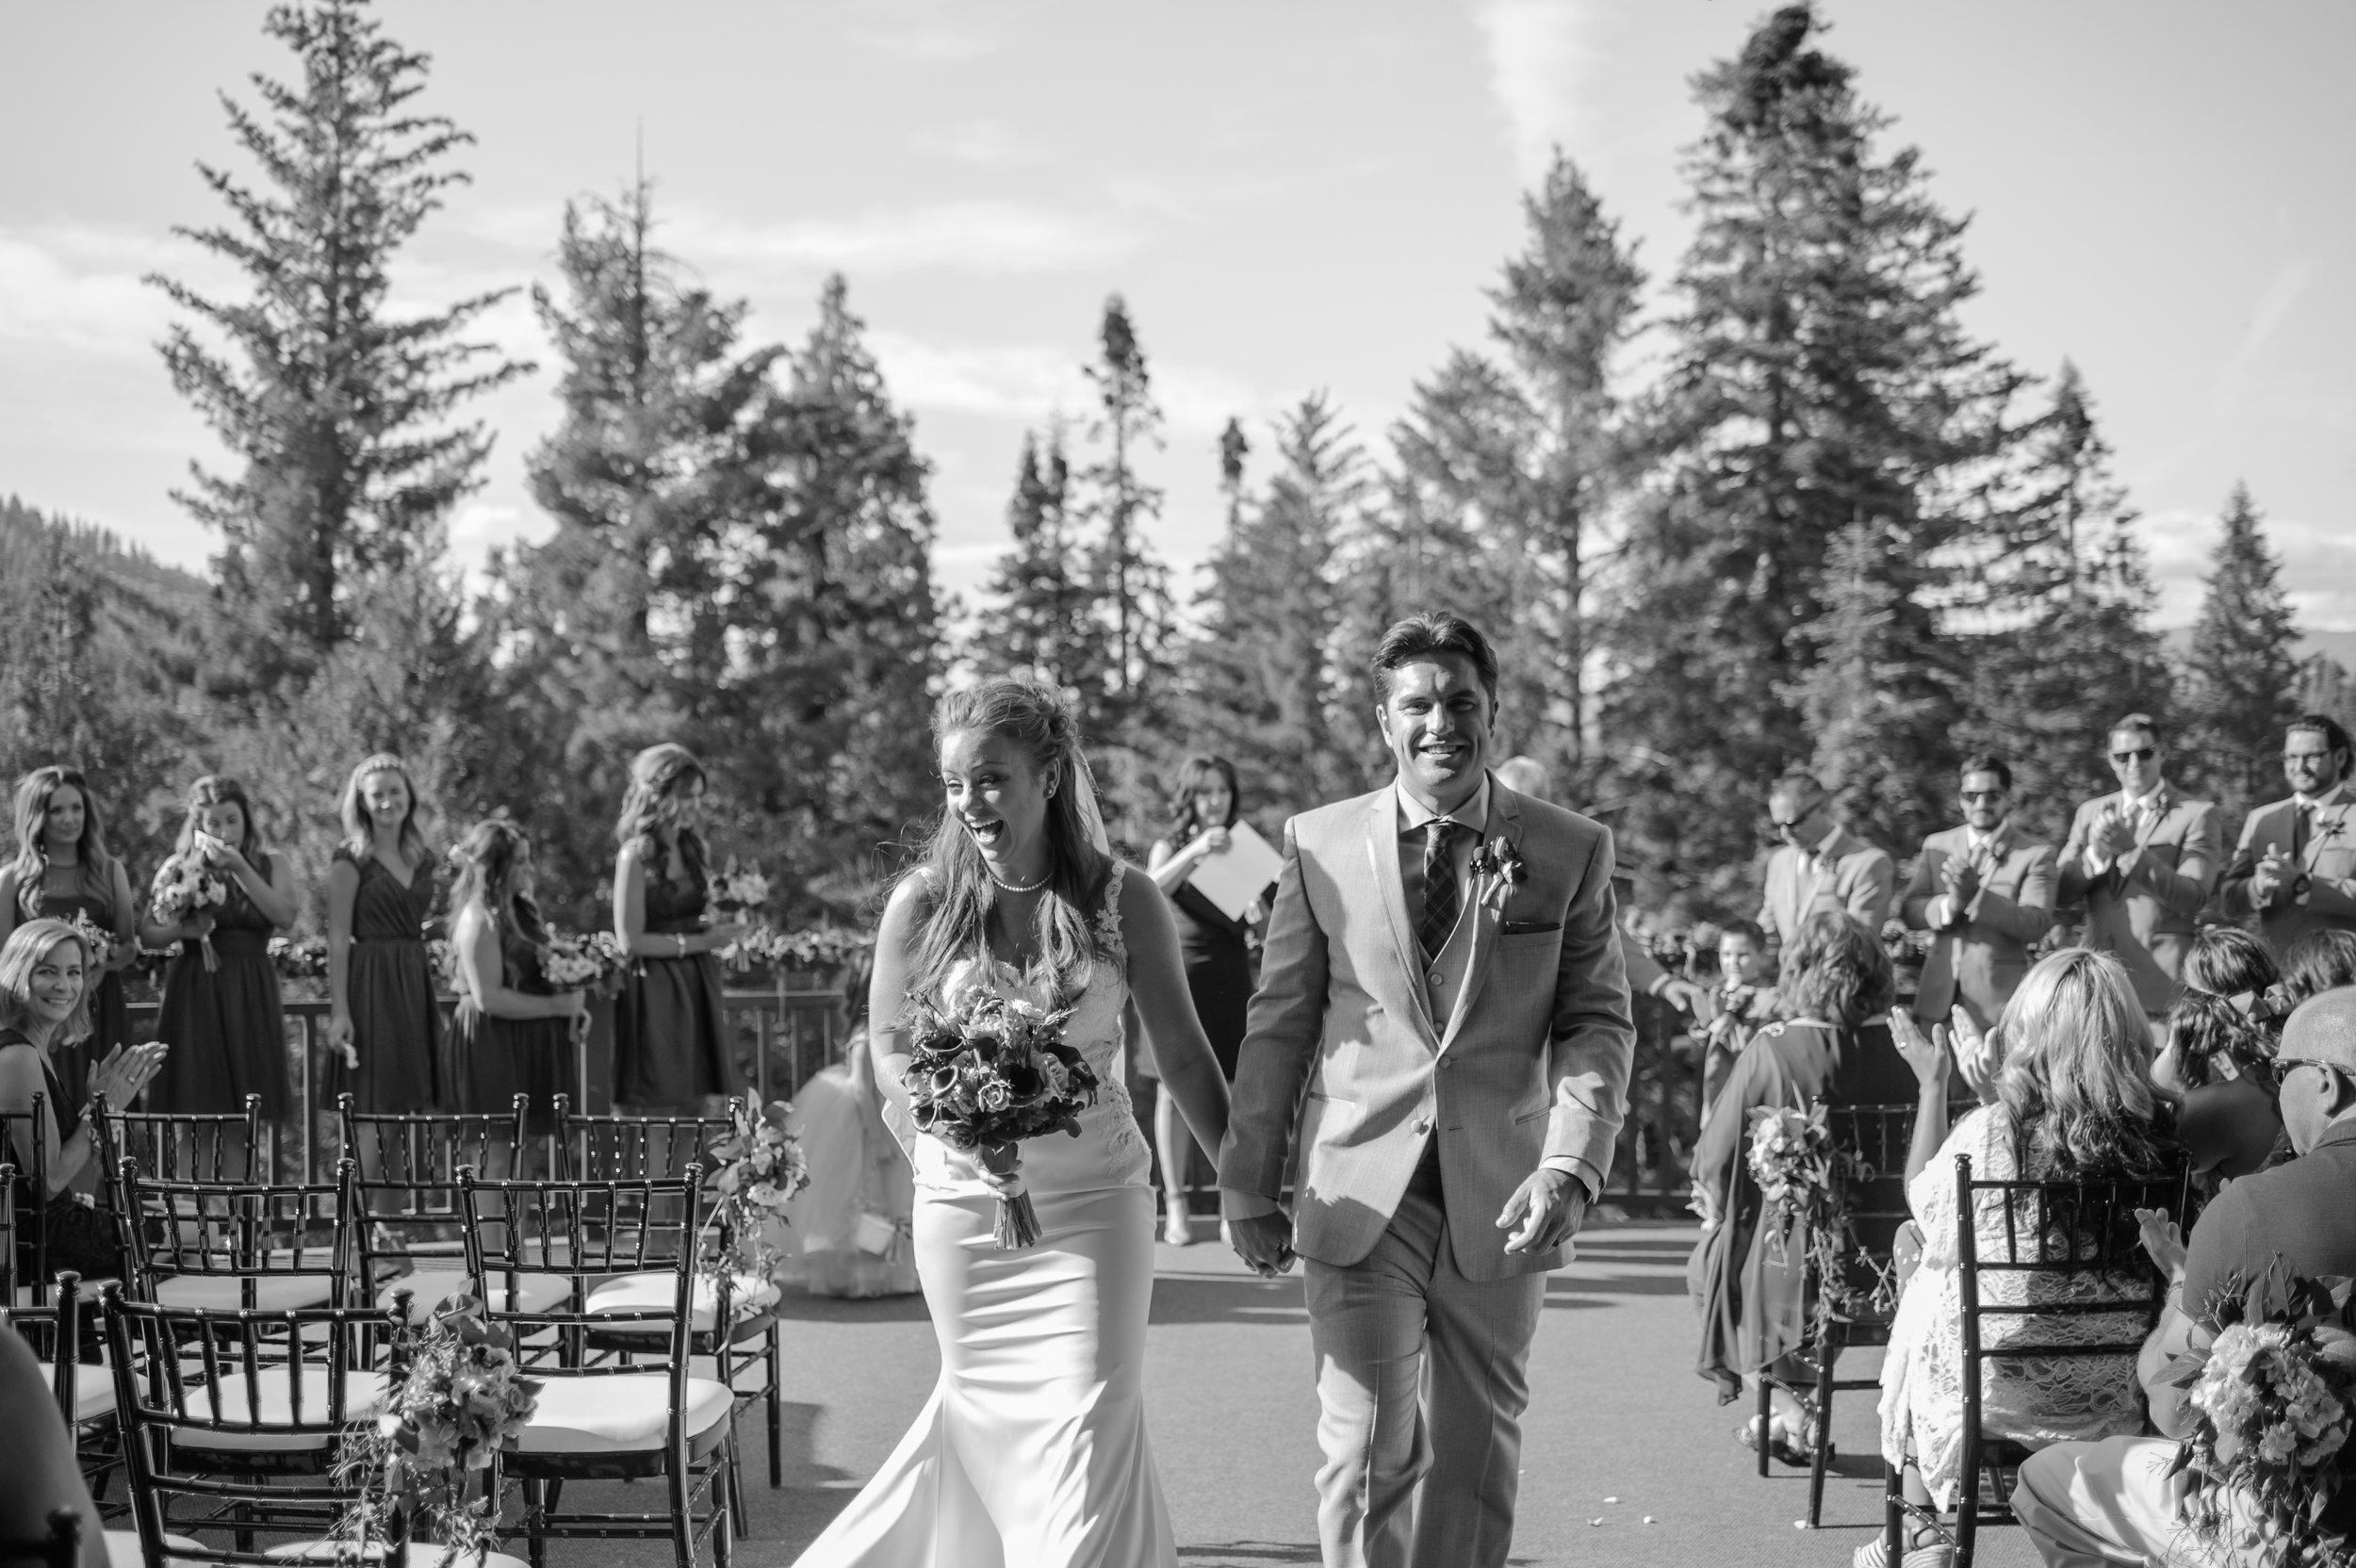 becca-jacob-021-tenaya-lodge-yosemite-wedding-photographer-katherine-nicole-photography.JPG